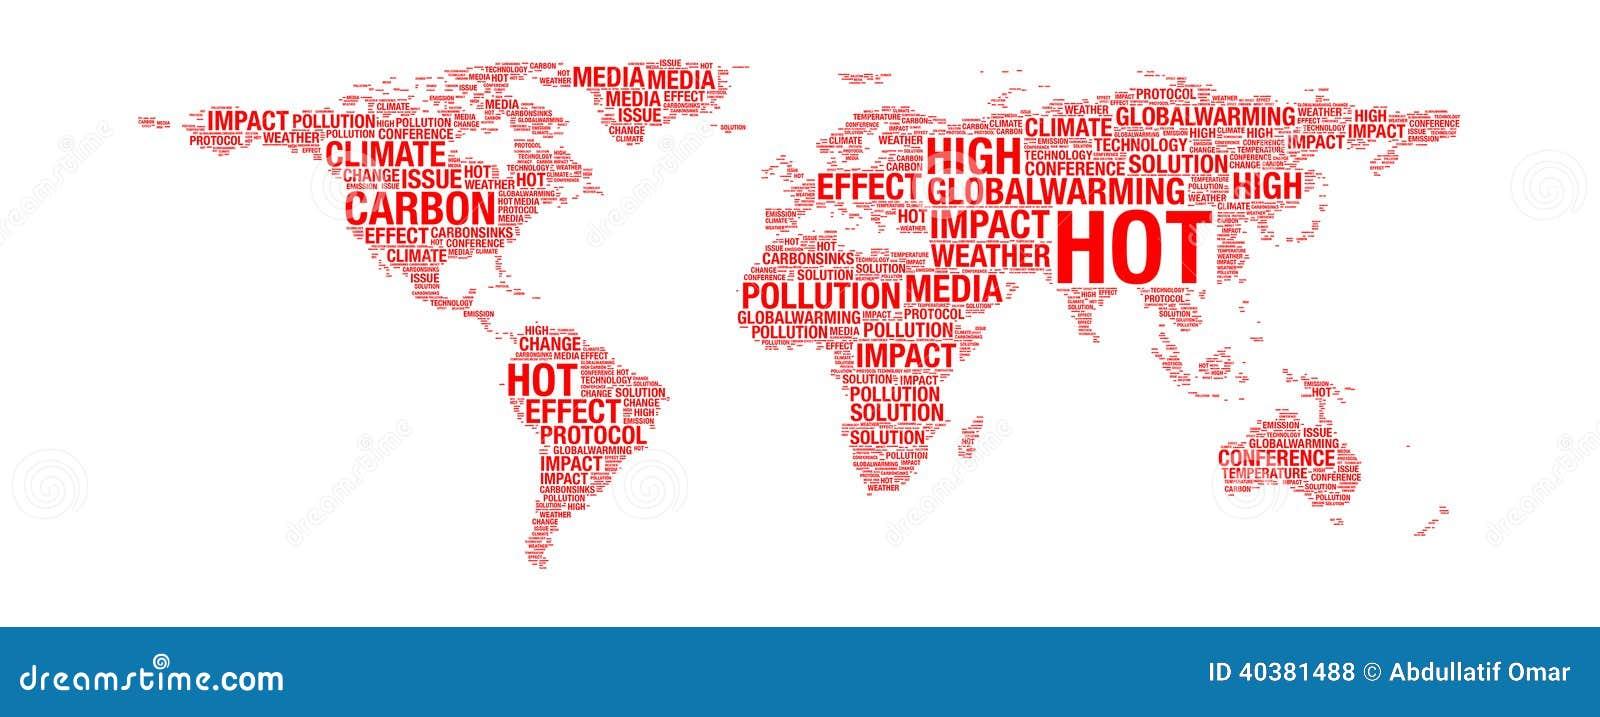 Global Warming Concept Map.Global Warming Concept On World Map Stock Illustration